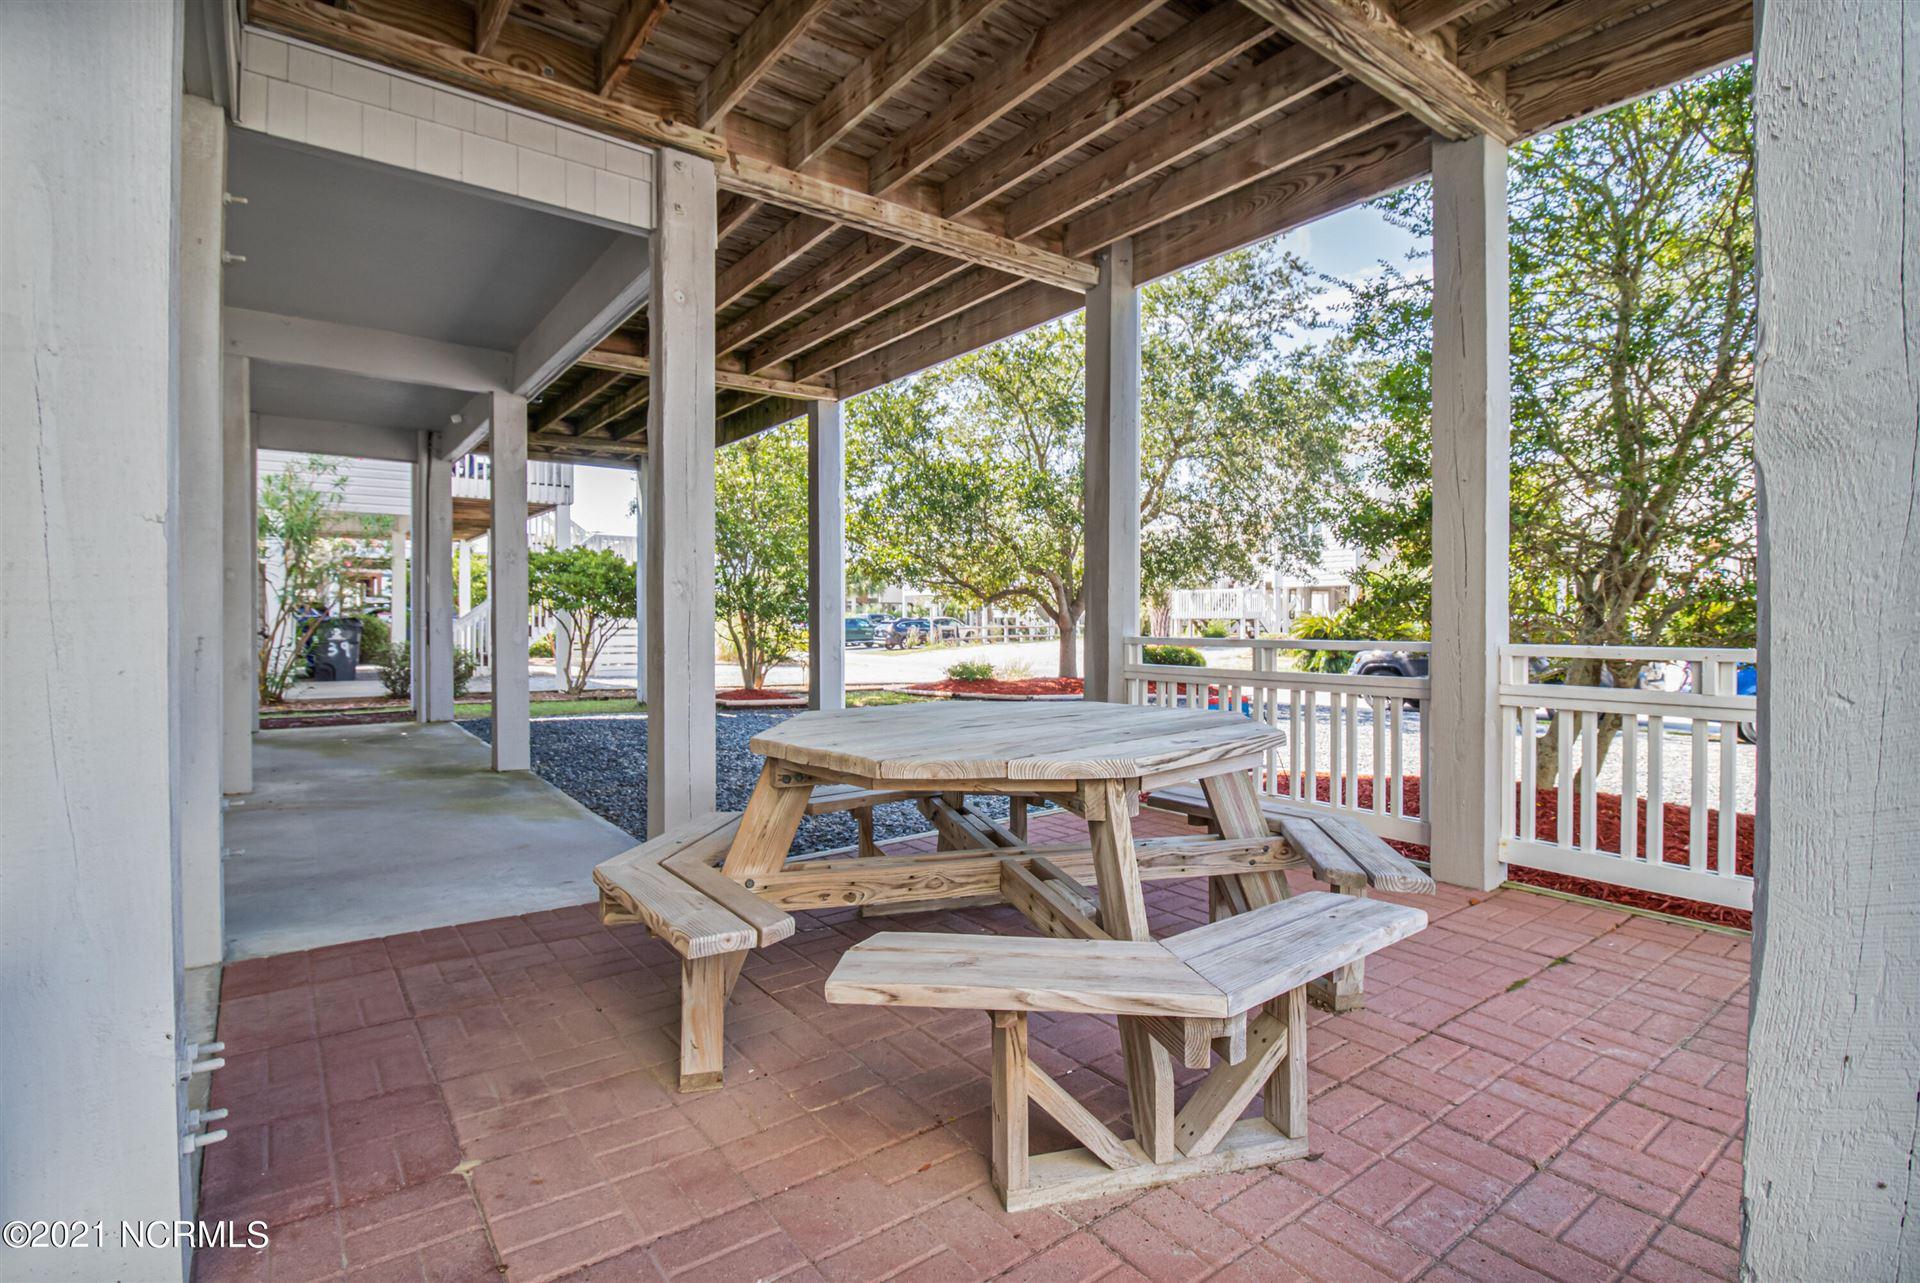 Photo of 37 Private Drive, Ocean Isle Beach, NC 28469 (MLS # 100287886)